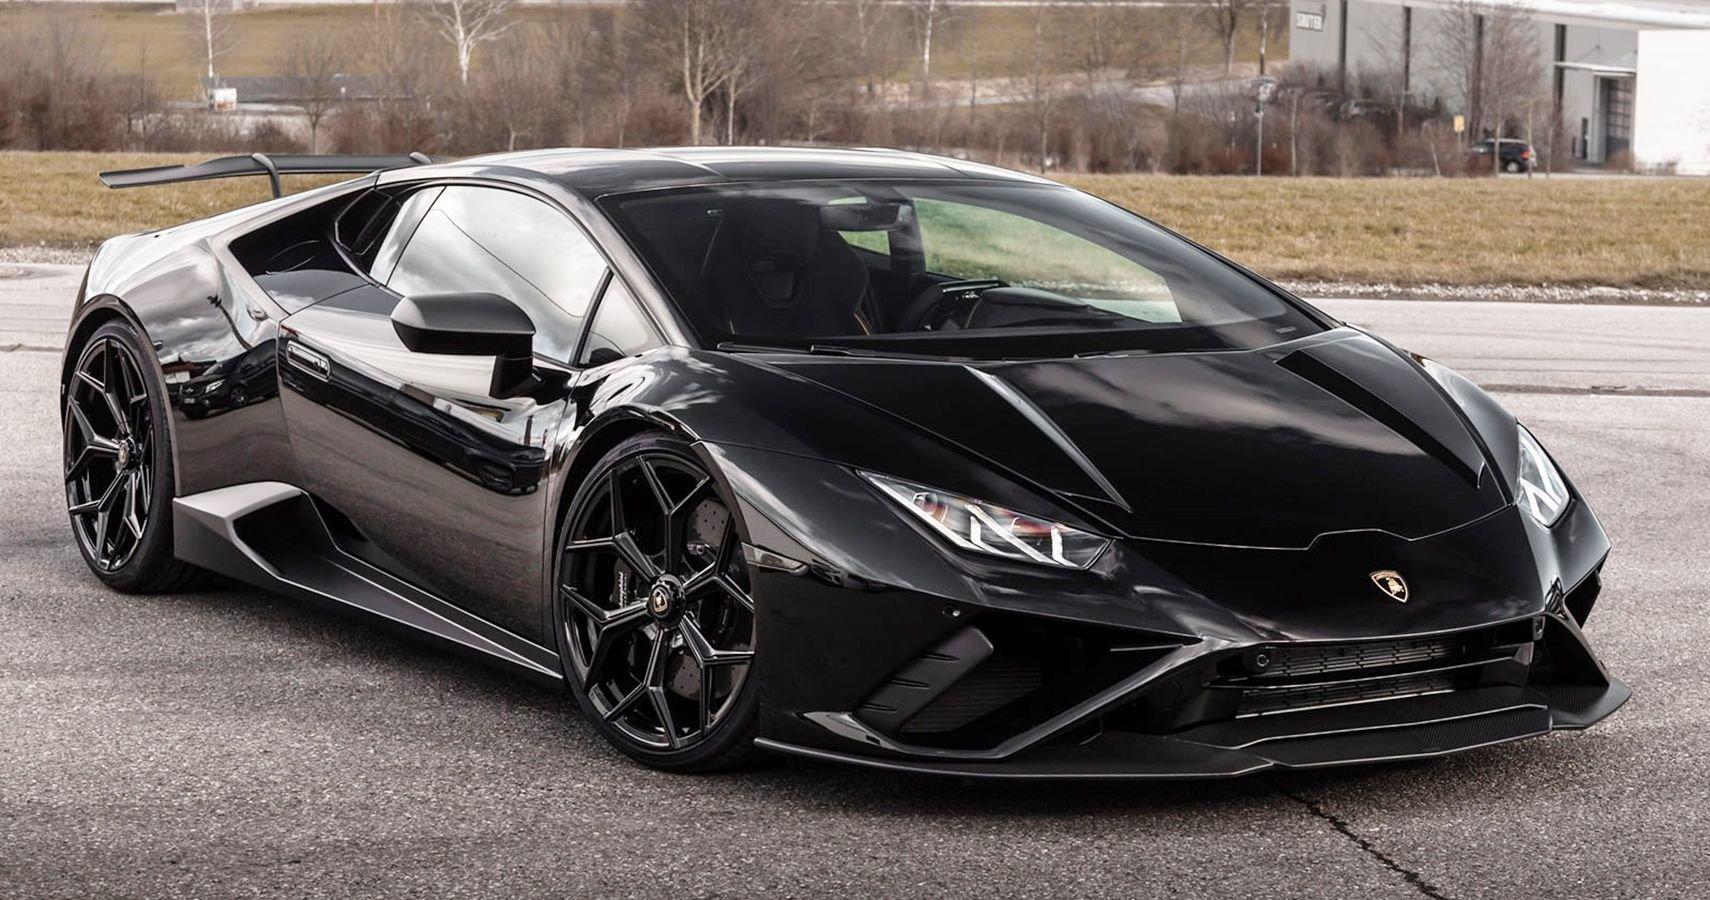 Novitec's Lamborghini Huracan Evo RWD Offers Handling Upgrades And Sporty Add-On Components